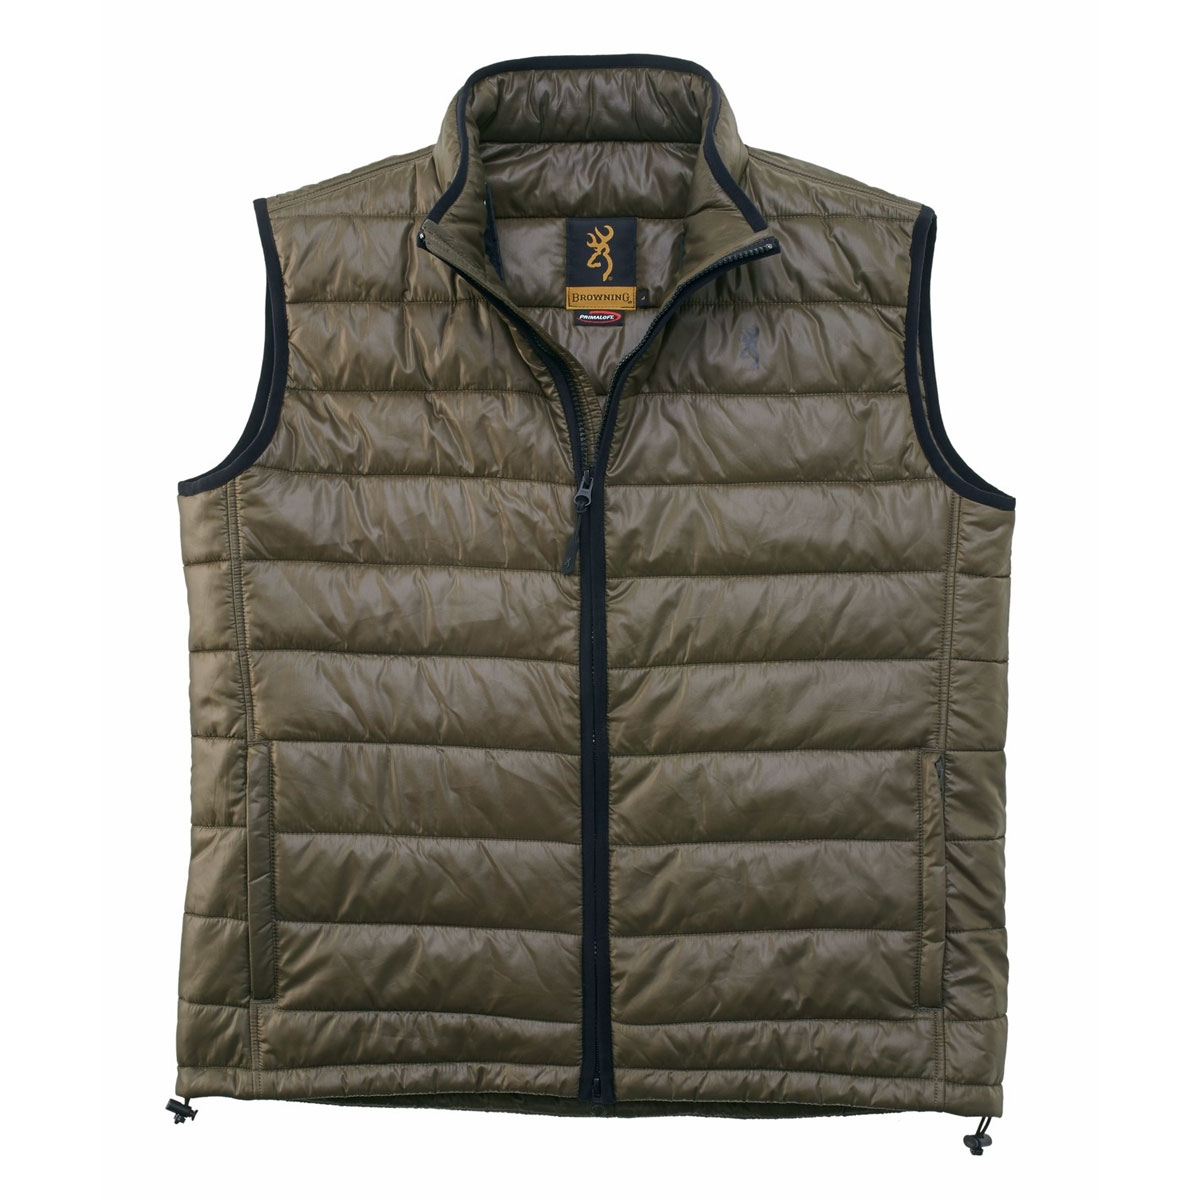 Browning Featherlight Primaloft Bodywarmer Vest